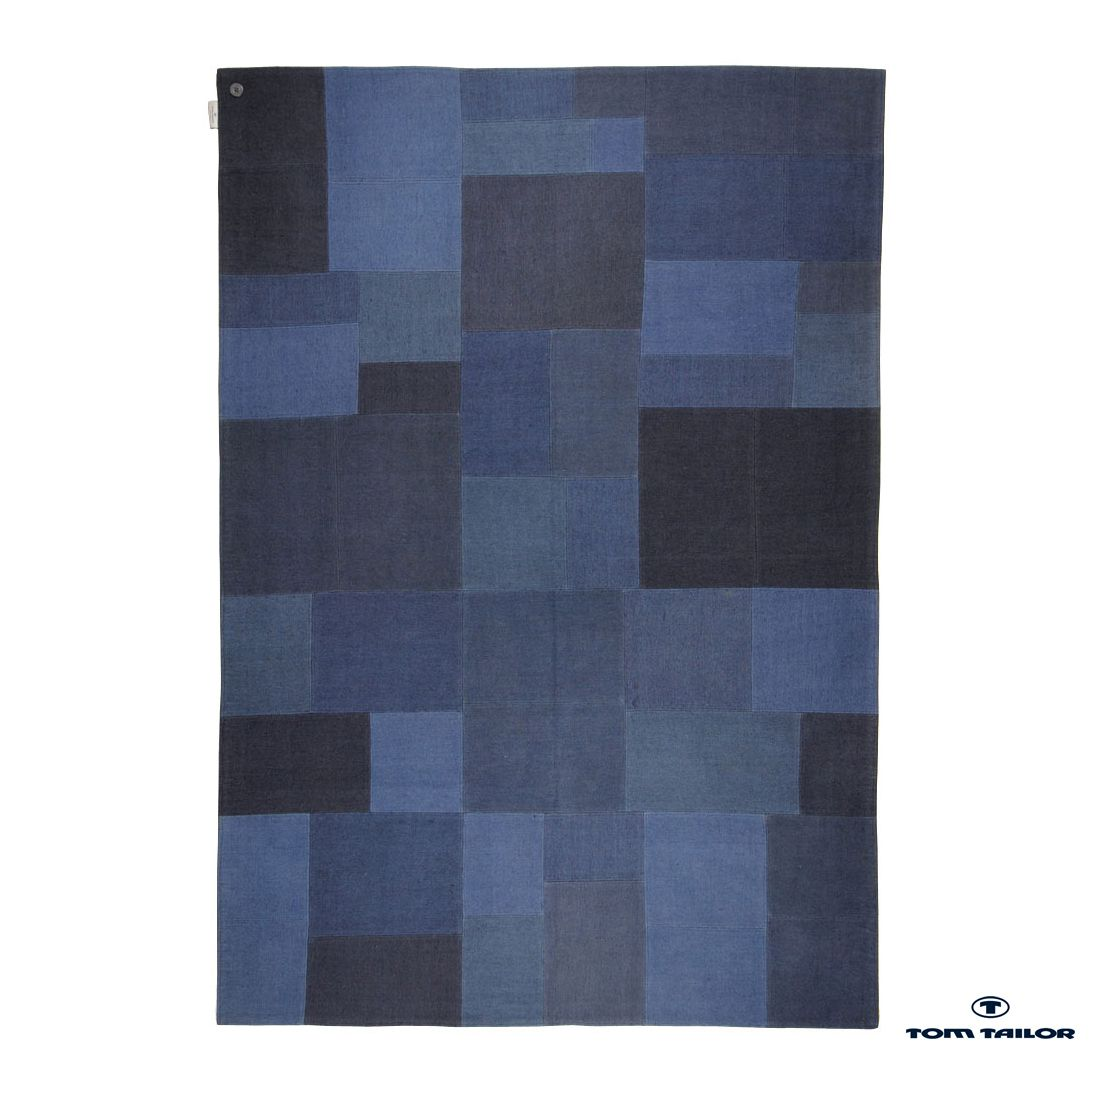 Tapijt Patch denim - blauw - 190x290cm, Tom Tailor